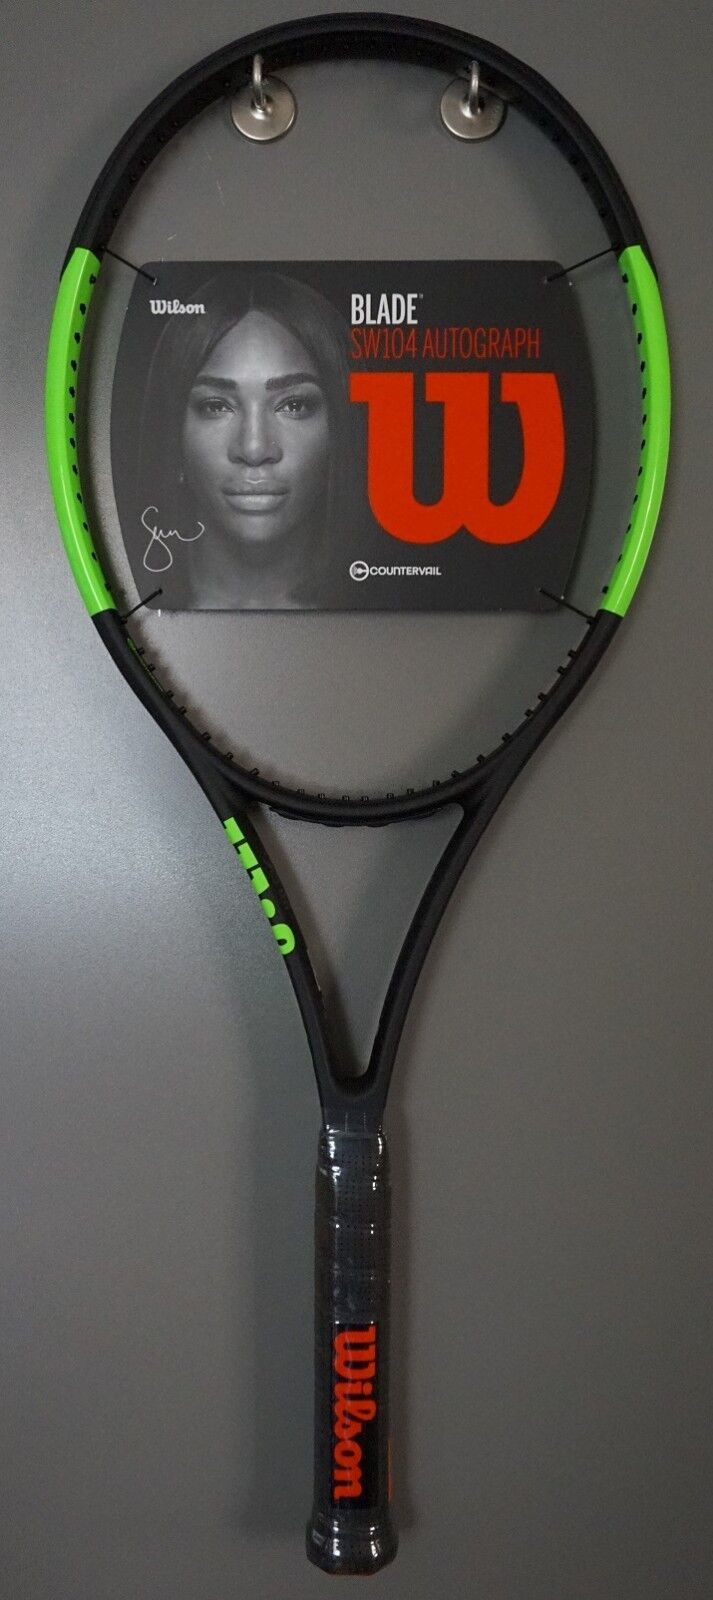 Nuevo Wilson  Blade SW104 autógrafo countervail 2018 2019 4 1 4 Raqueta De Tenis  marcas de moda